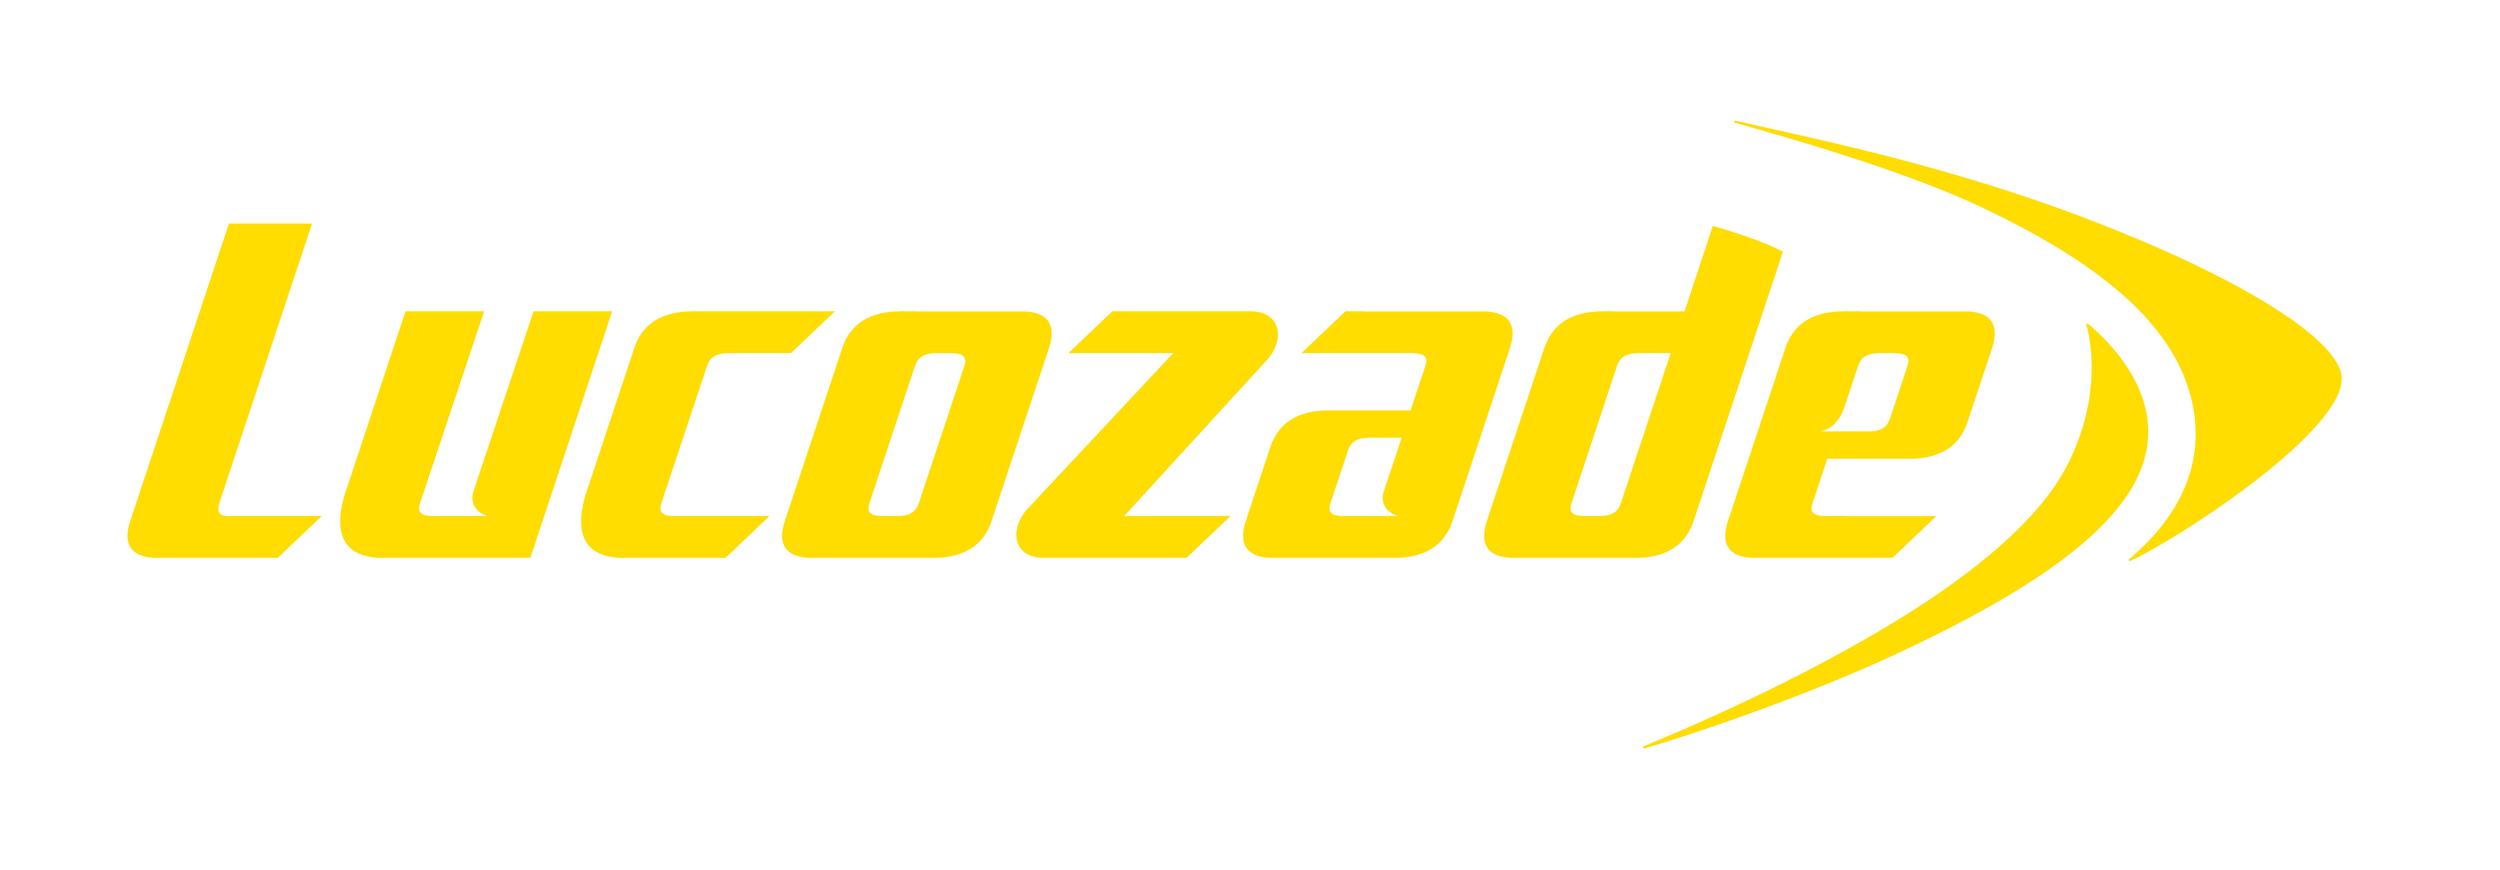 Lucozade_master_logo_yellow.jpeg